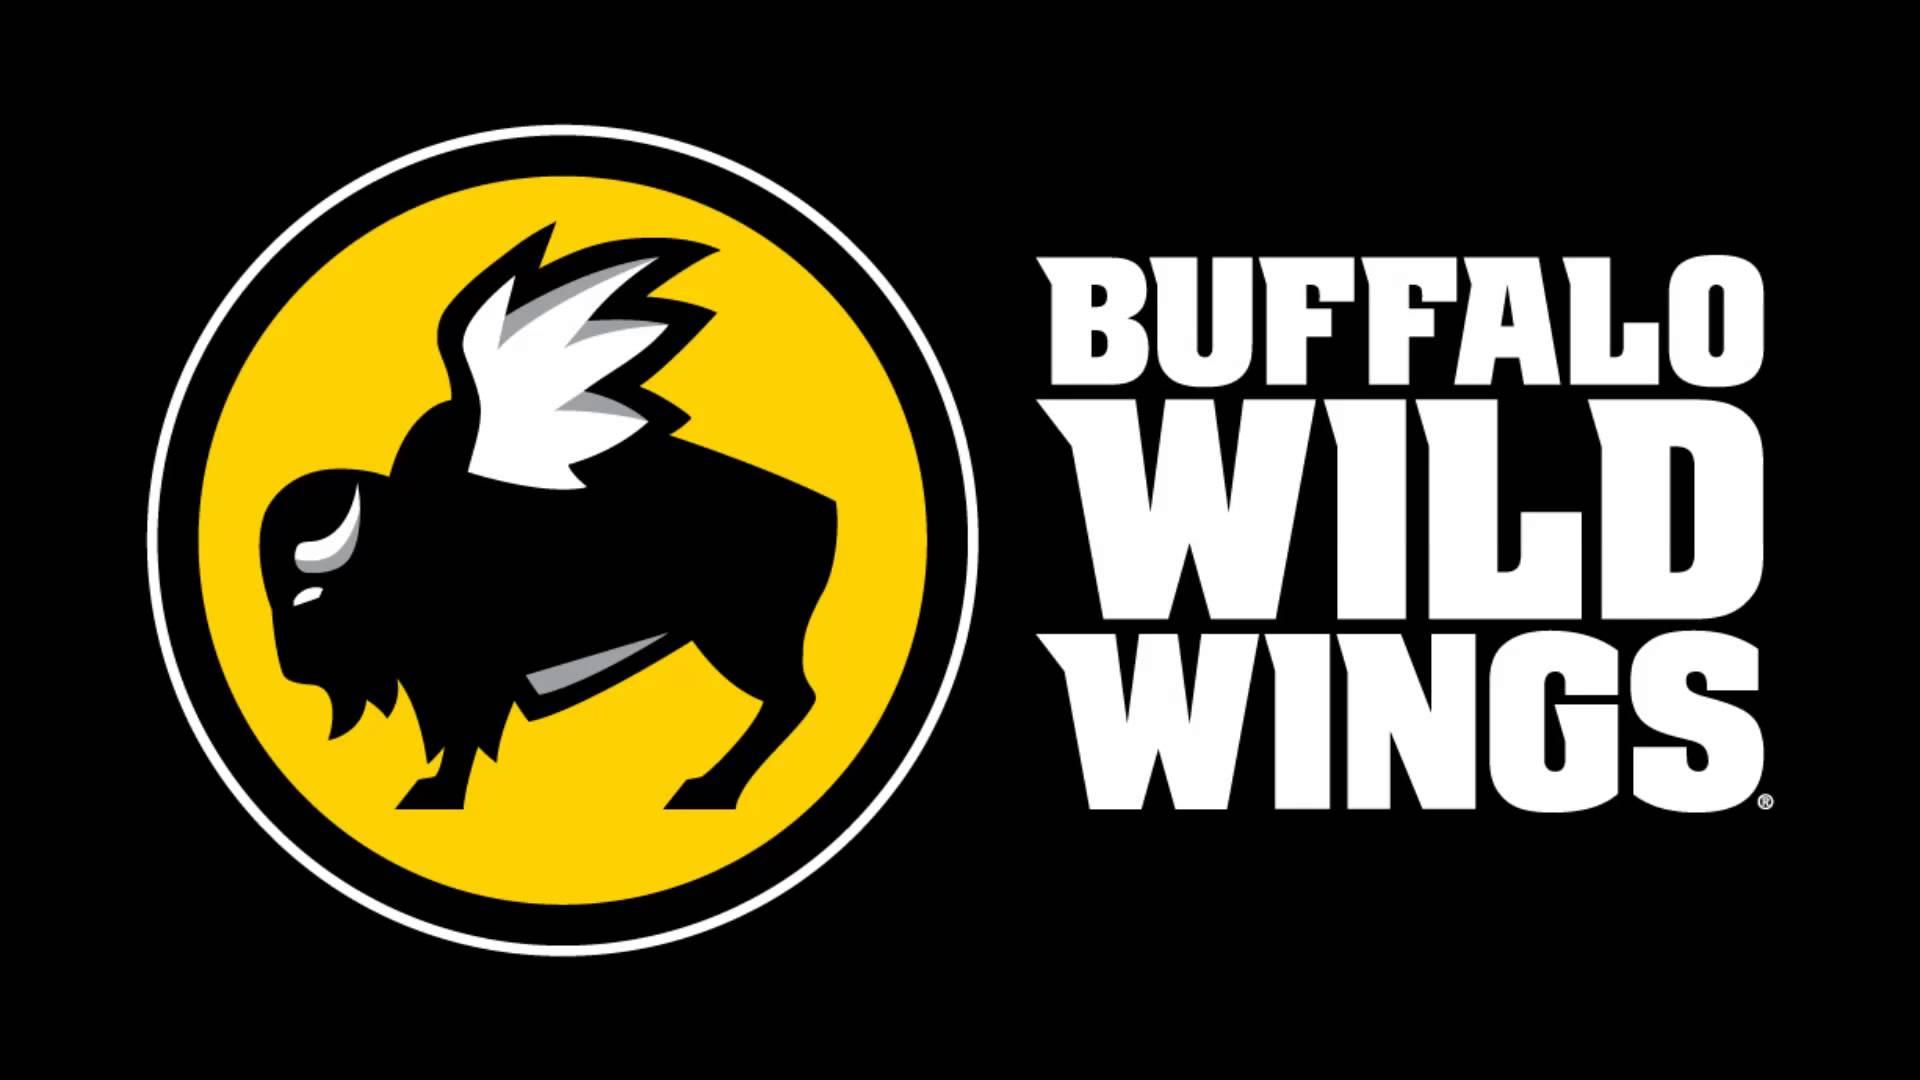 Buffalo Wild Wings Wallpapers Wallpaper Cave